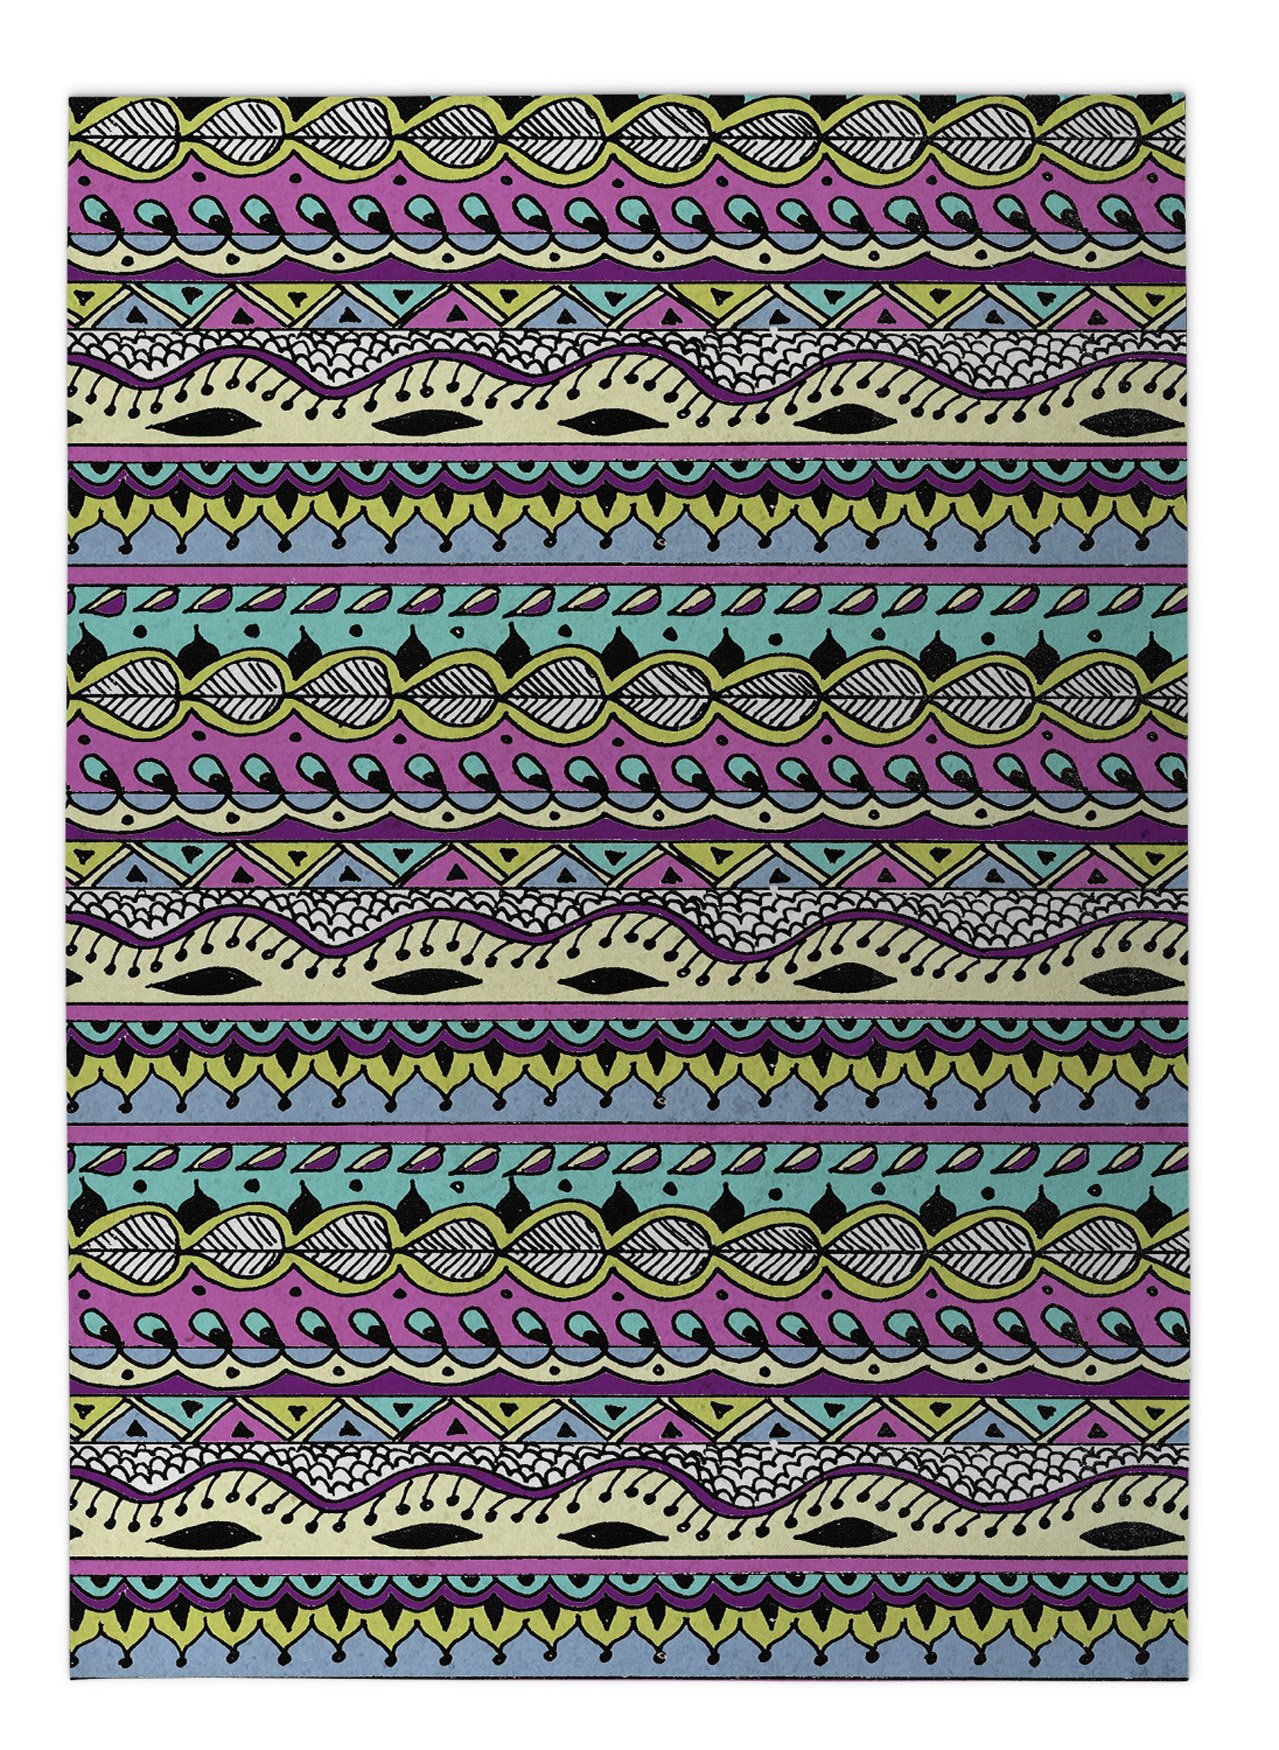 KAVKA Designs Color Dance Indoor-Outdoor Floor Mat, (Blue/Pink/Purple/Yellow) - , Size: 60x84x0.2 - (PLUAVC110FM57)